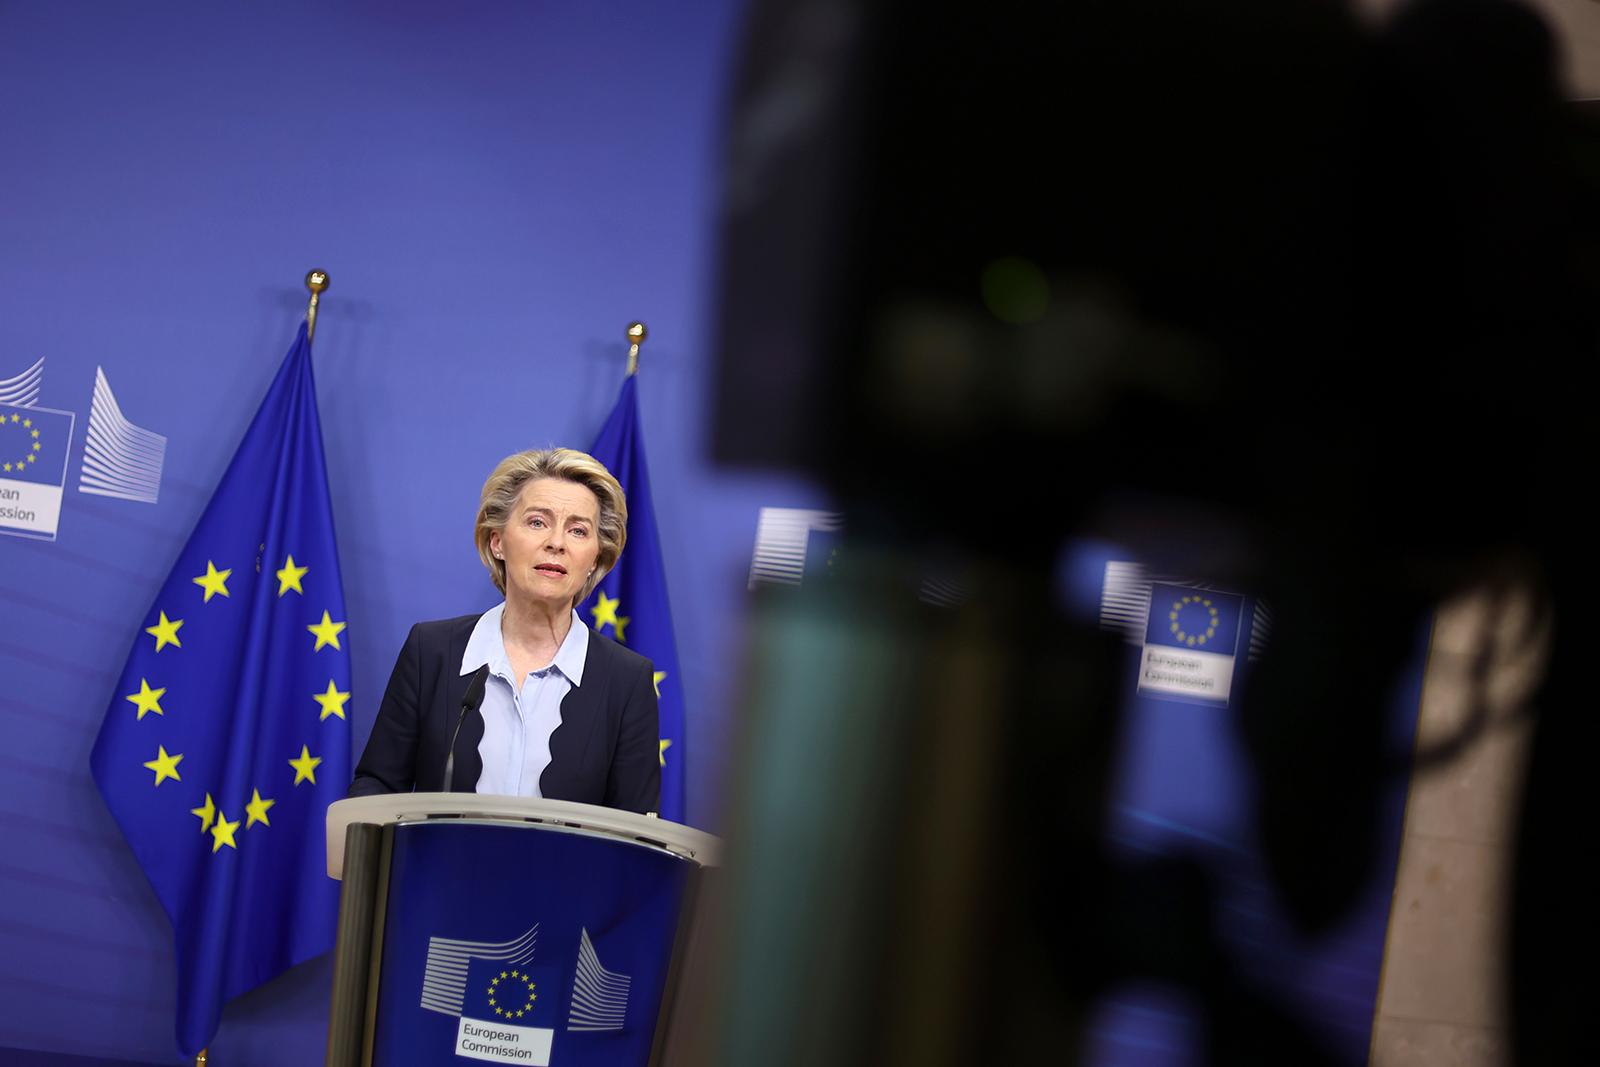 European Commission President Ursula von der Leyen gives a statement at the EU headquarters in Brussels, Monday, Novem 16.